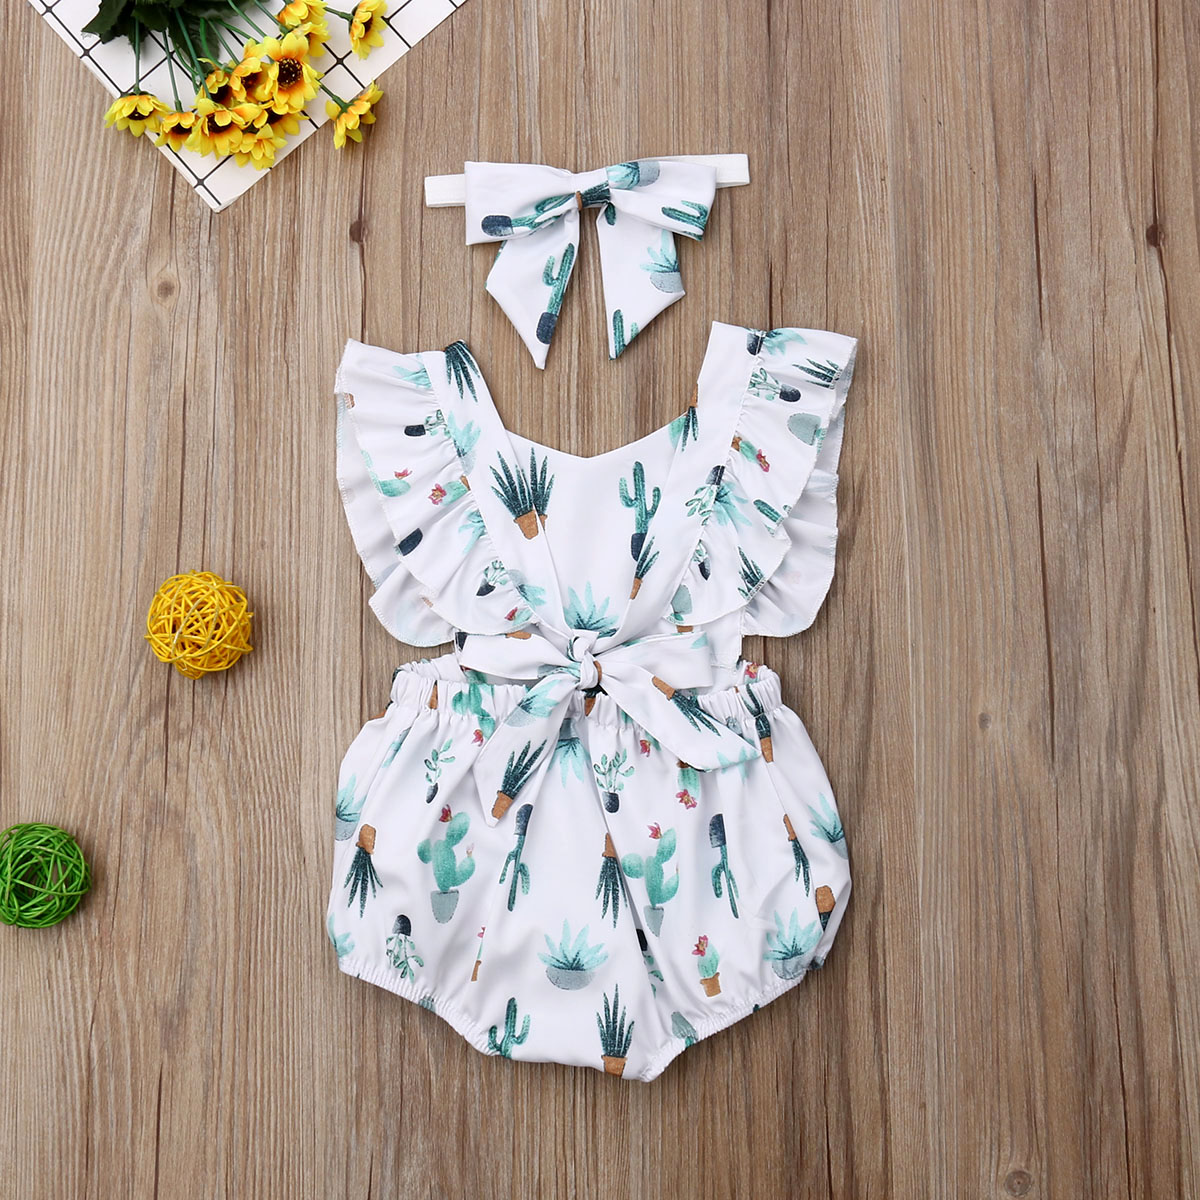 For Newborn Baby Girl Bodysuit Jumpsuit + Headband 2pieces Set